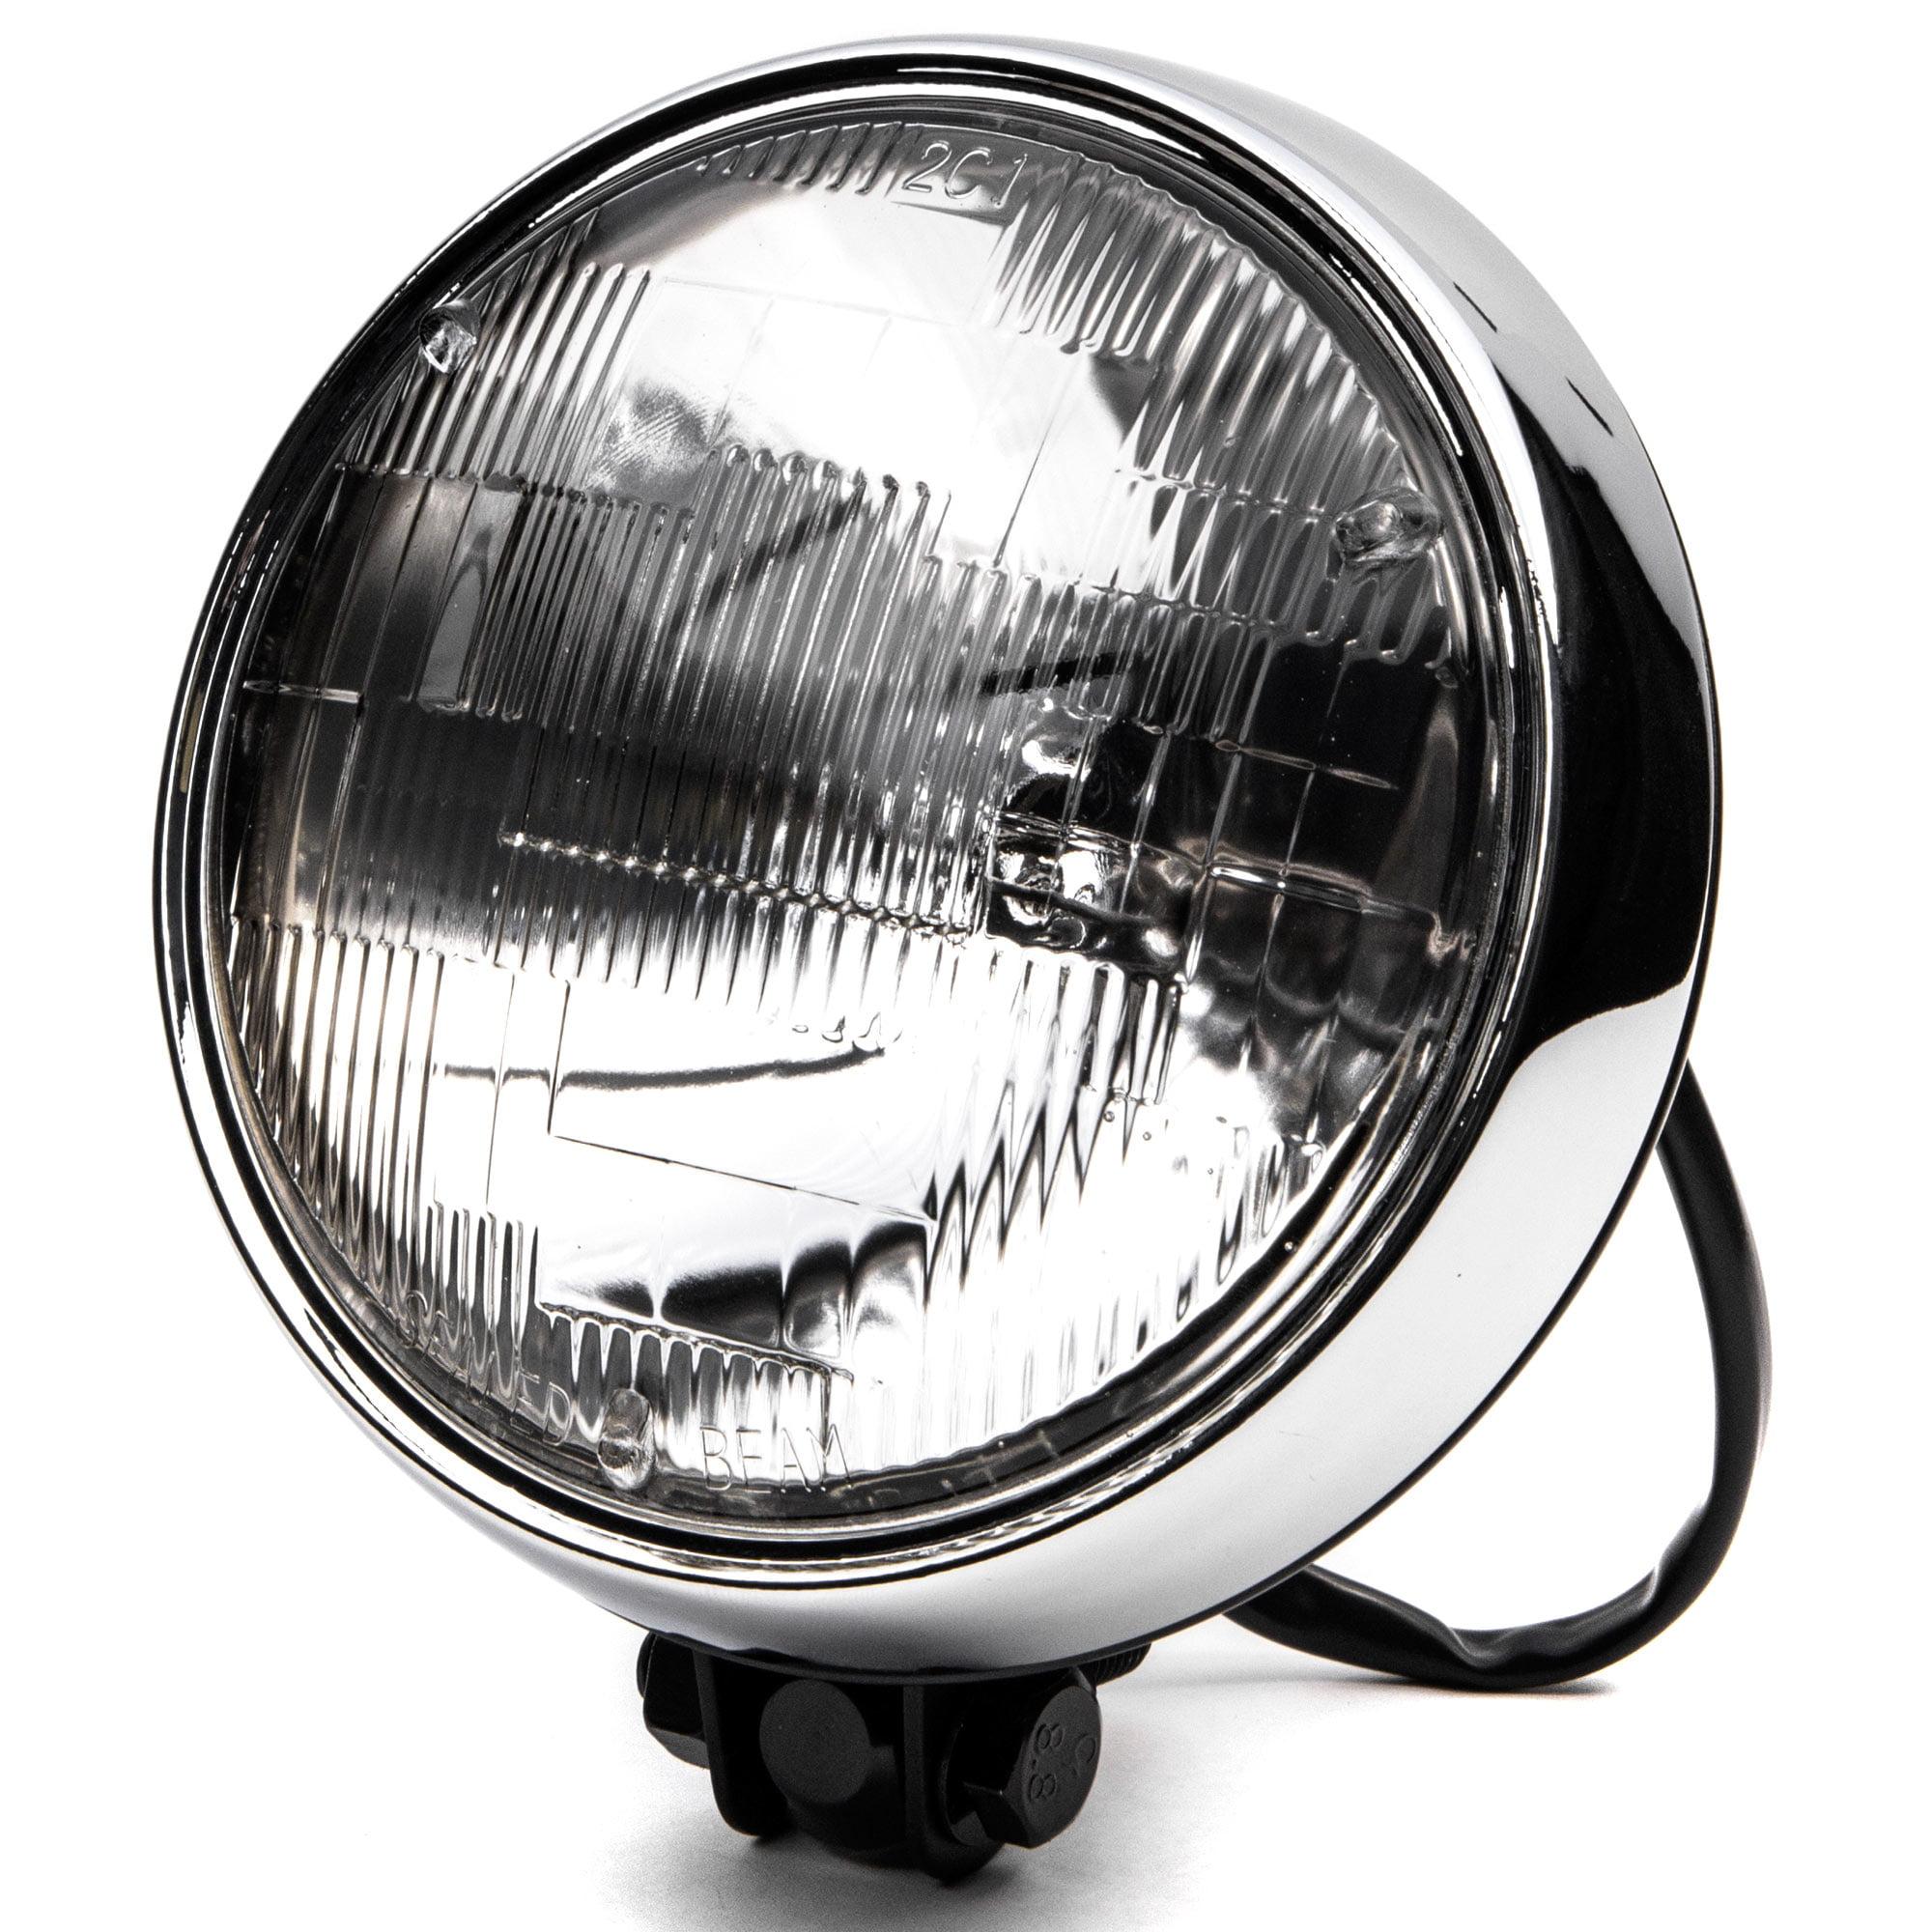 "Krator 6"" Black w/ Chrome Ring Motorcycle Headlight Bottom Mount Running Light Hi/Lo for Honda Gold Wing Goldwing 1200 1500 1800 - image 8 of 8"